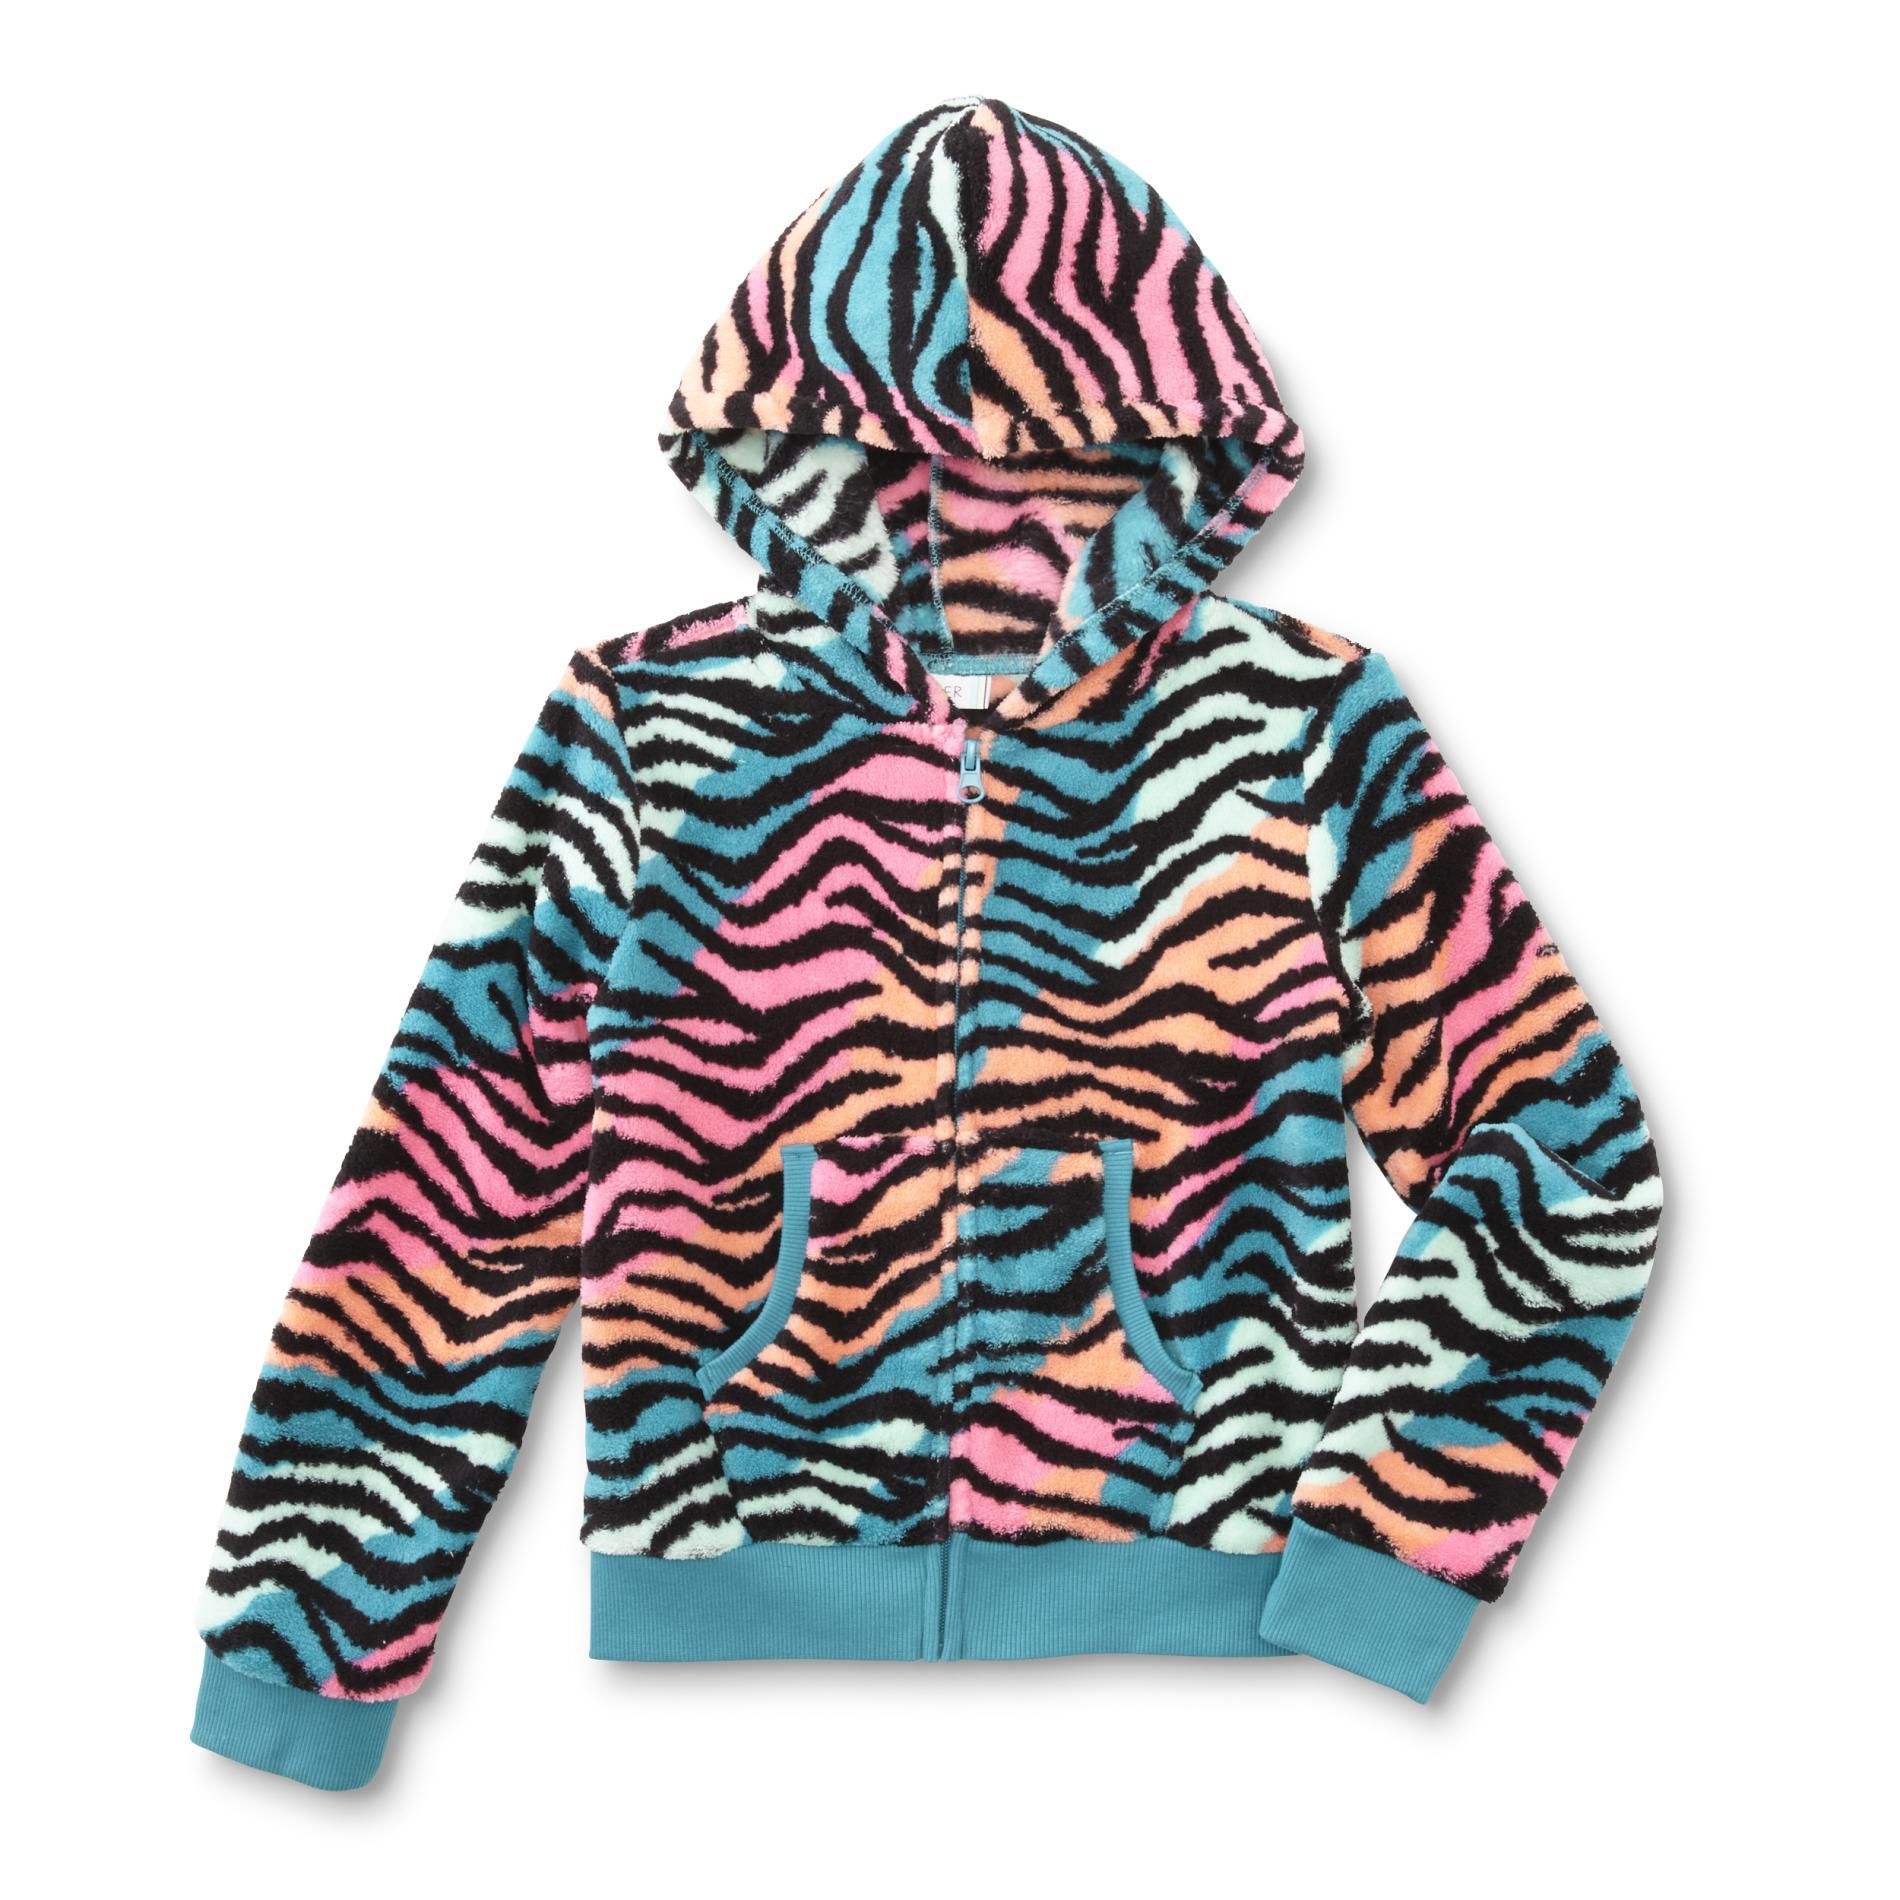 Piper Girl's Plush Hoodie Jacket - Zebra Print PartNumber: 049VA89401512P MfgPartNumber: GF6PP31001BG